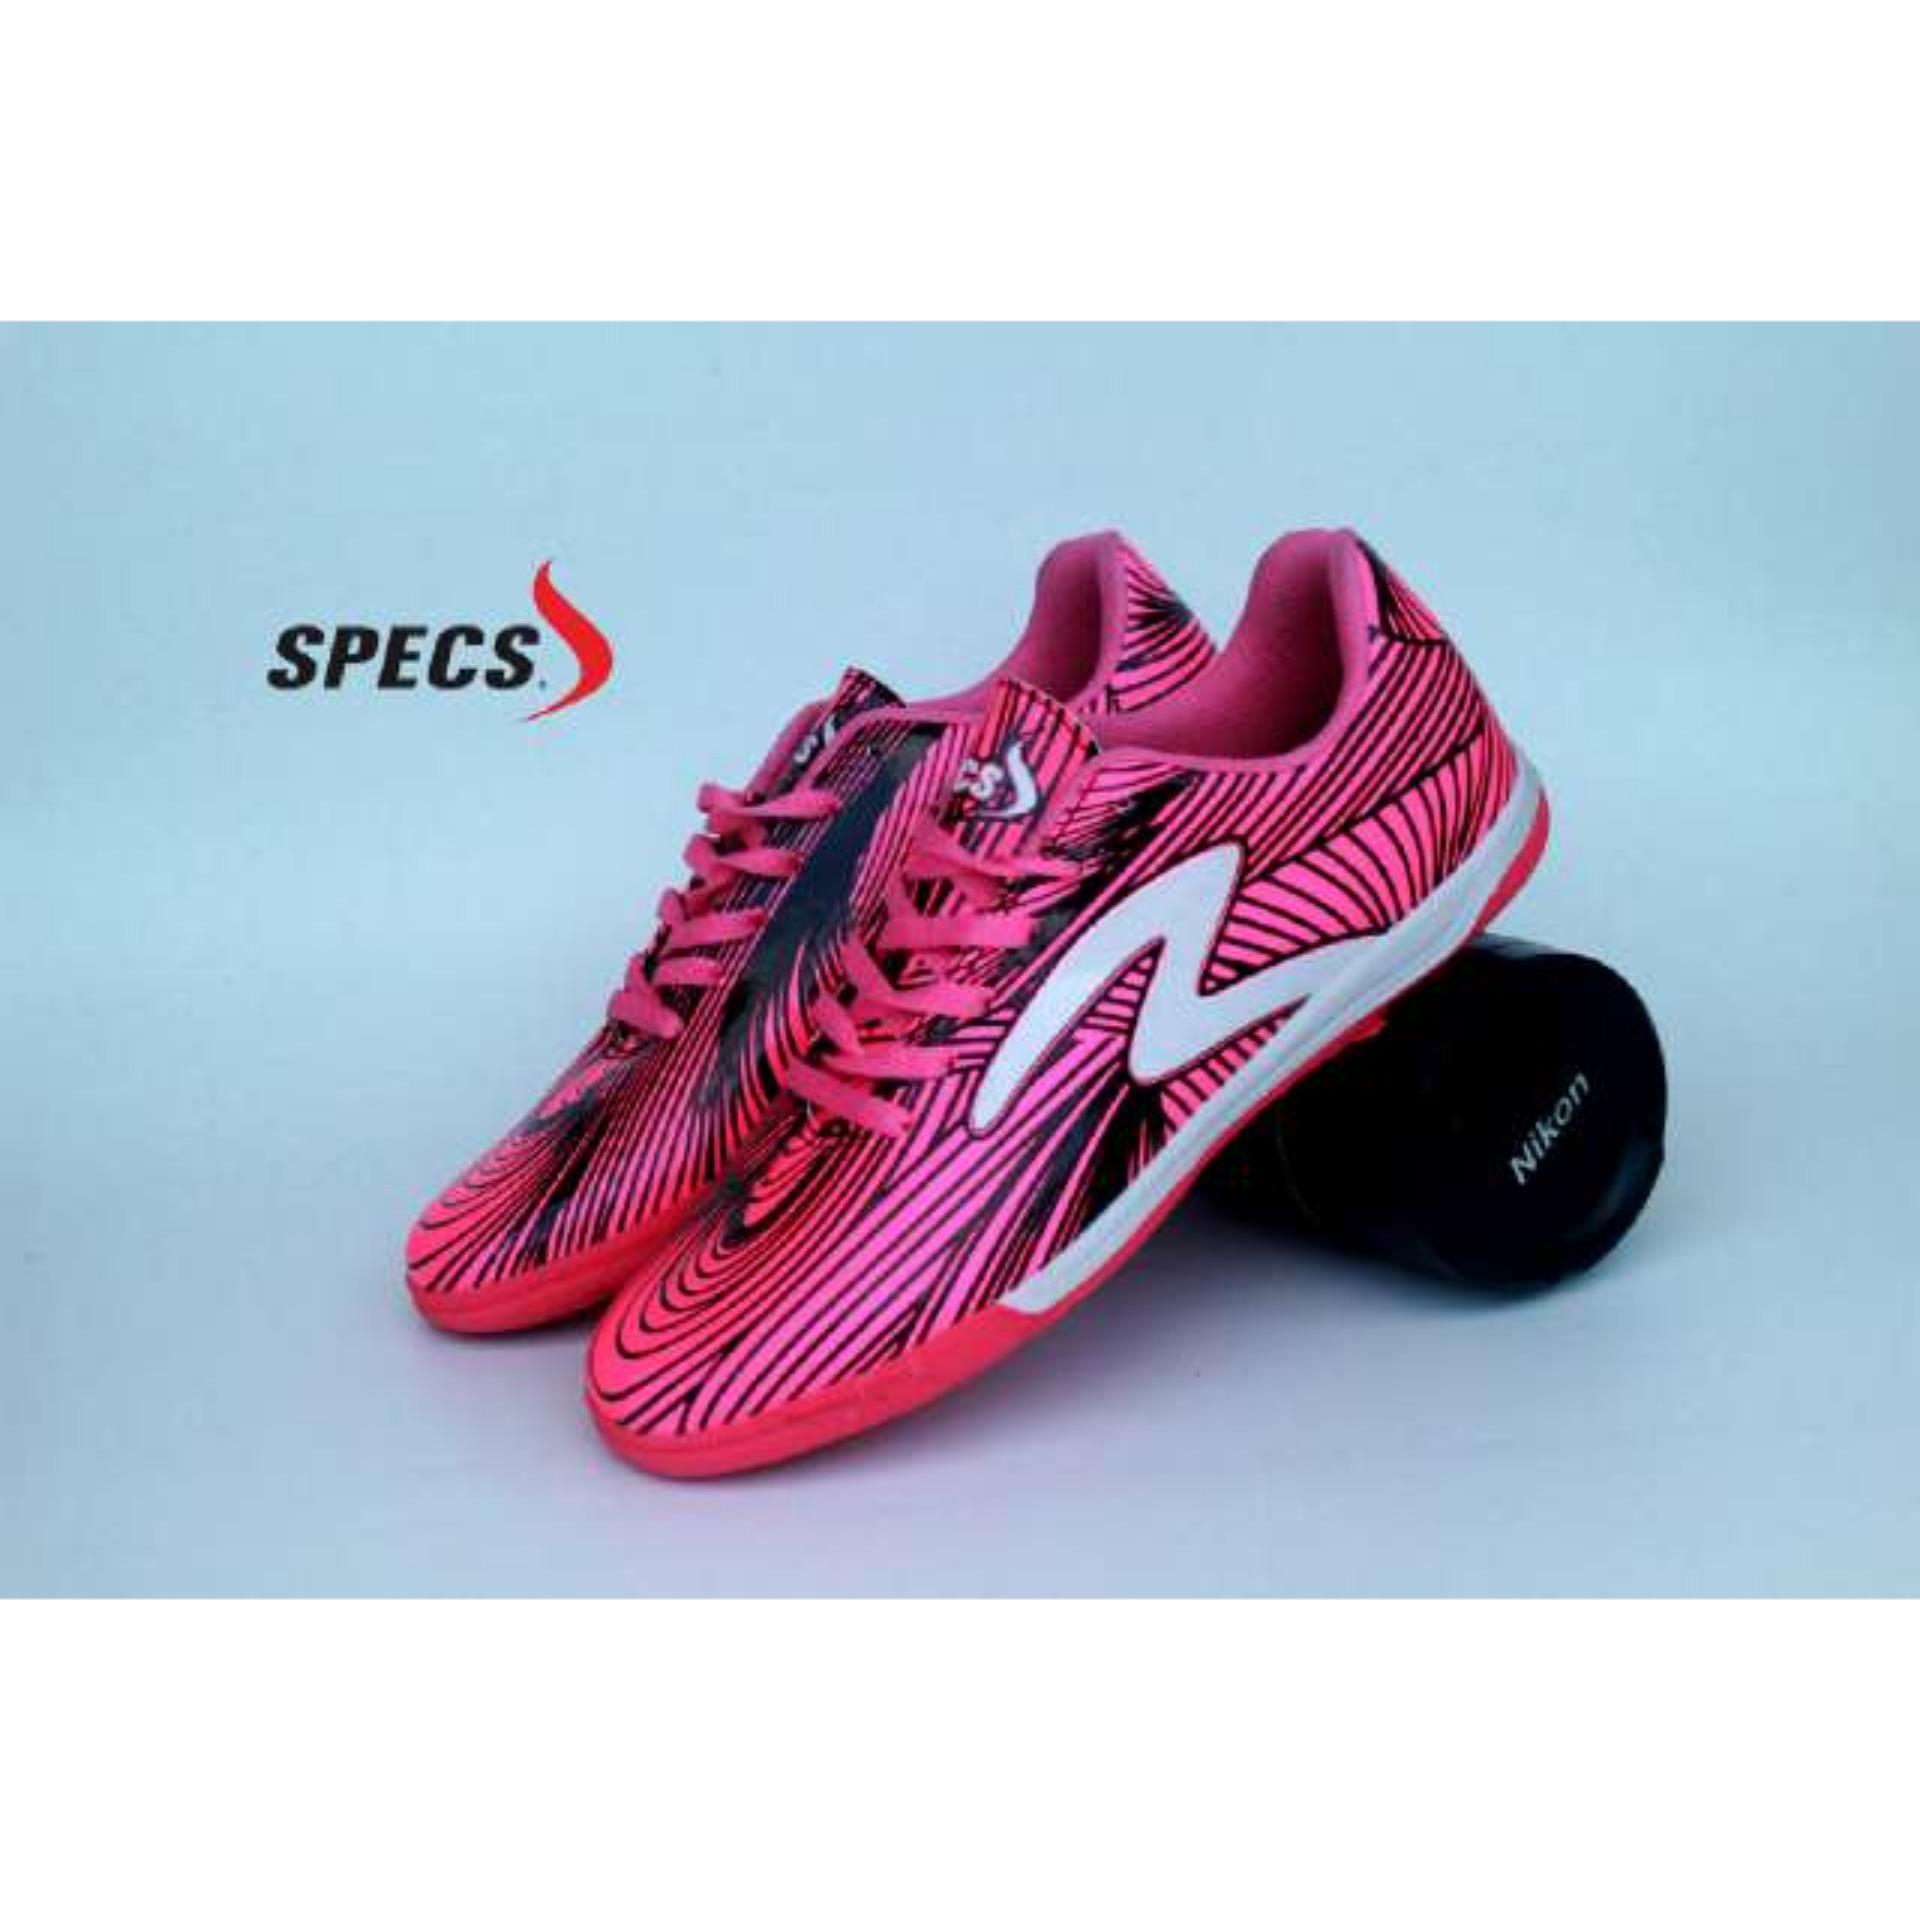 Sepatu Olahraga Futsal Specs Baricida Murah Terlaris-Sepatu Futsal Keren